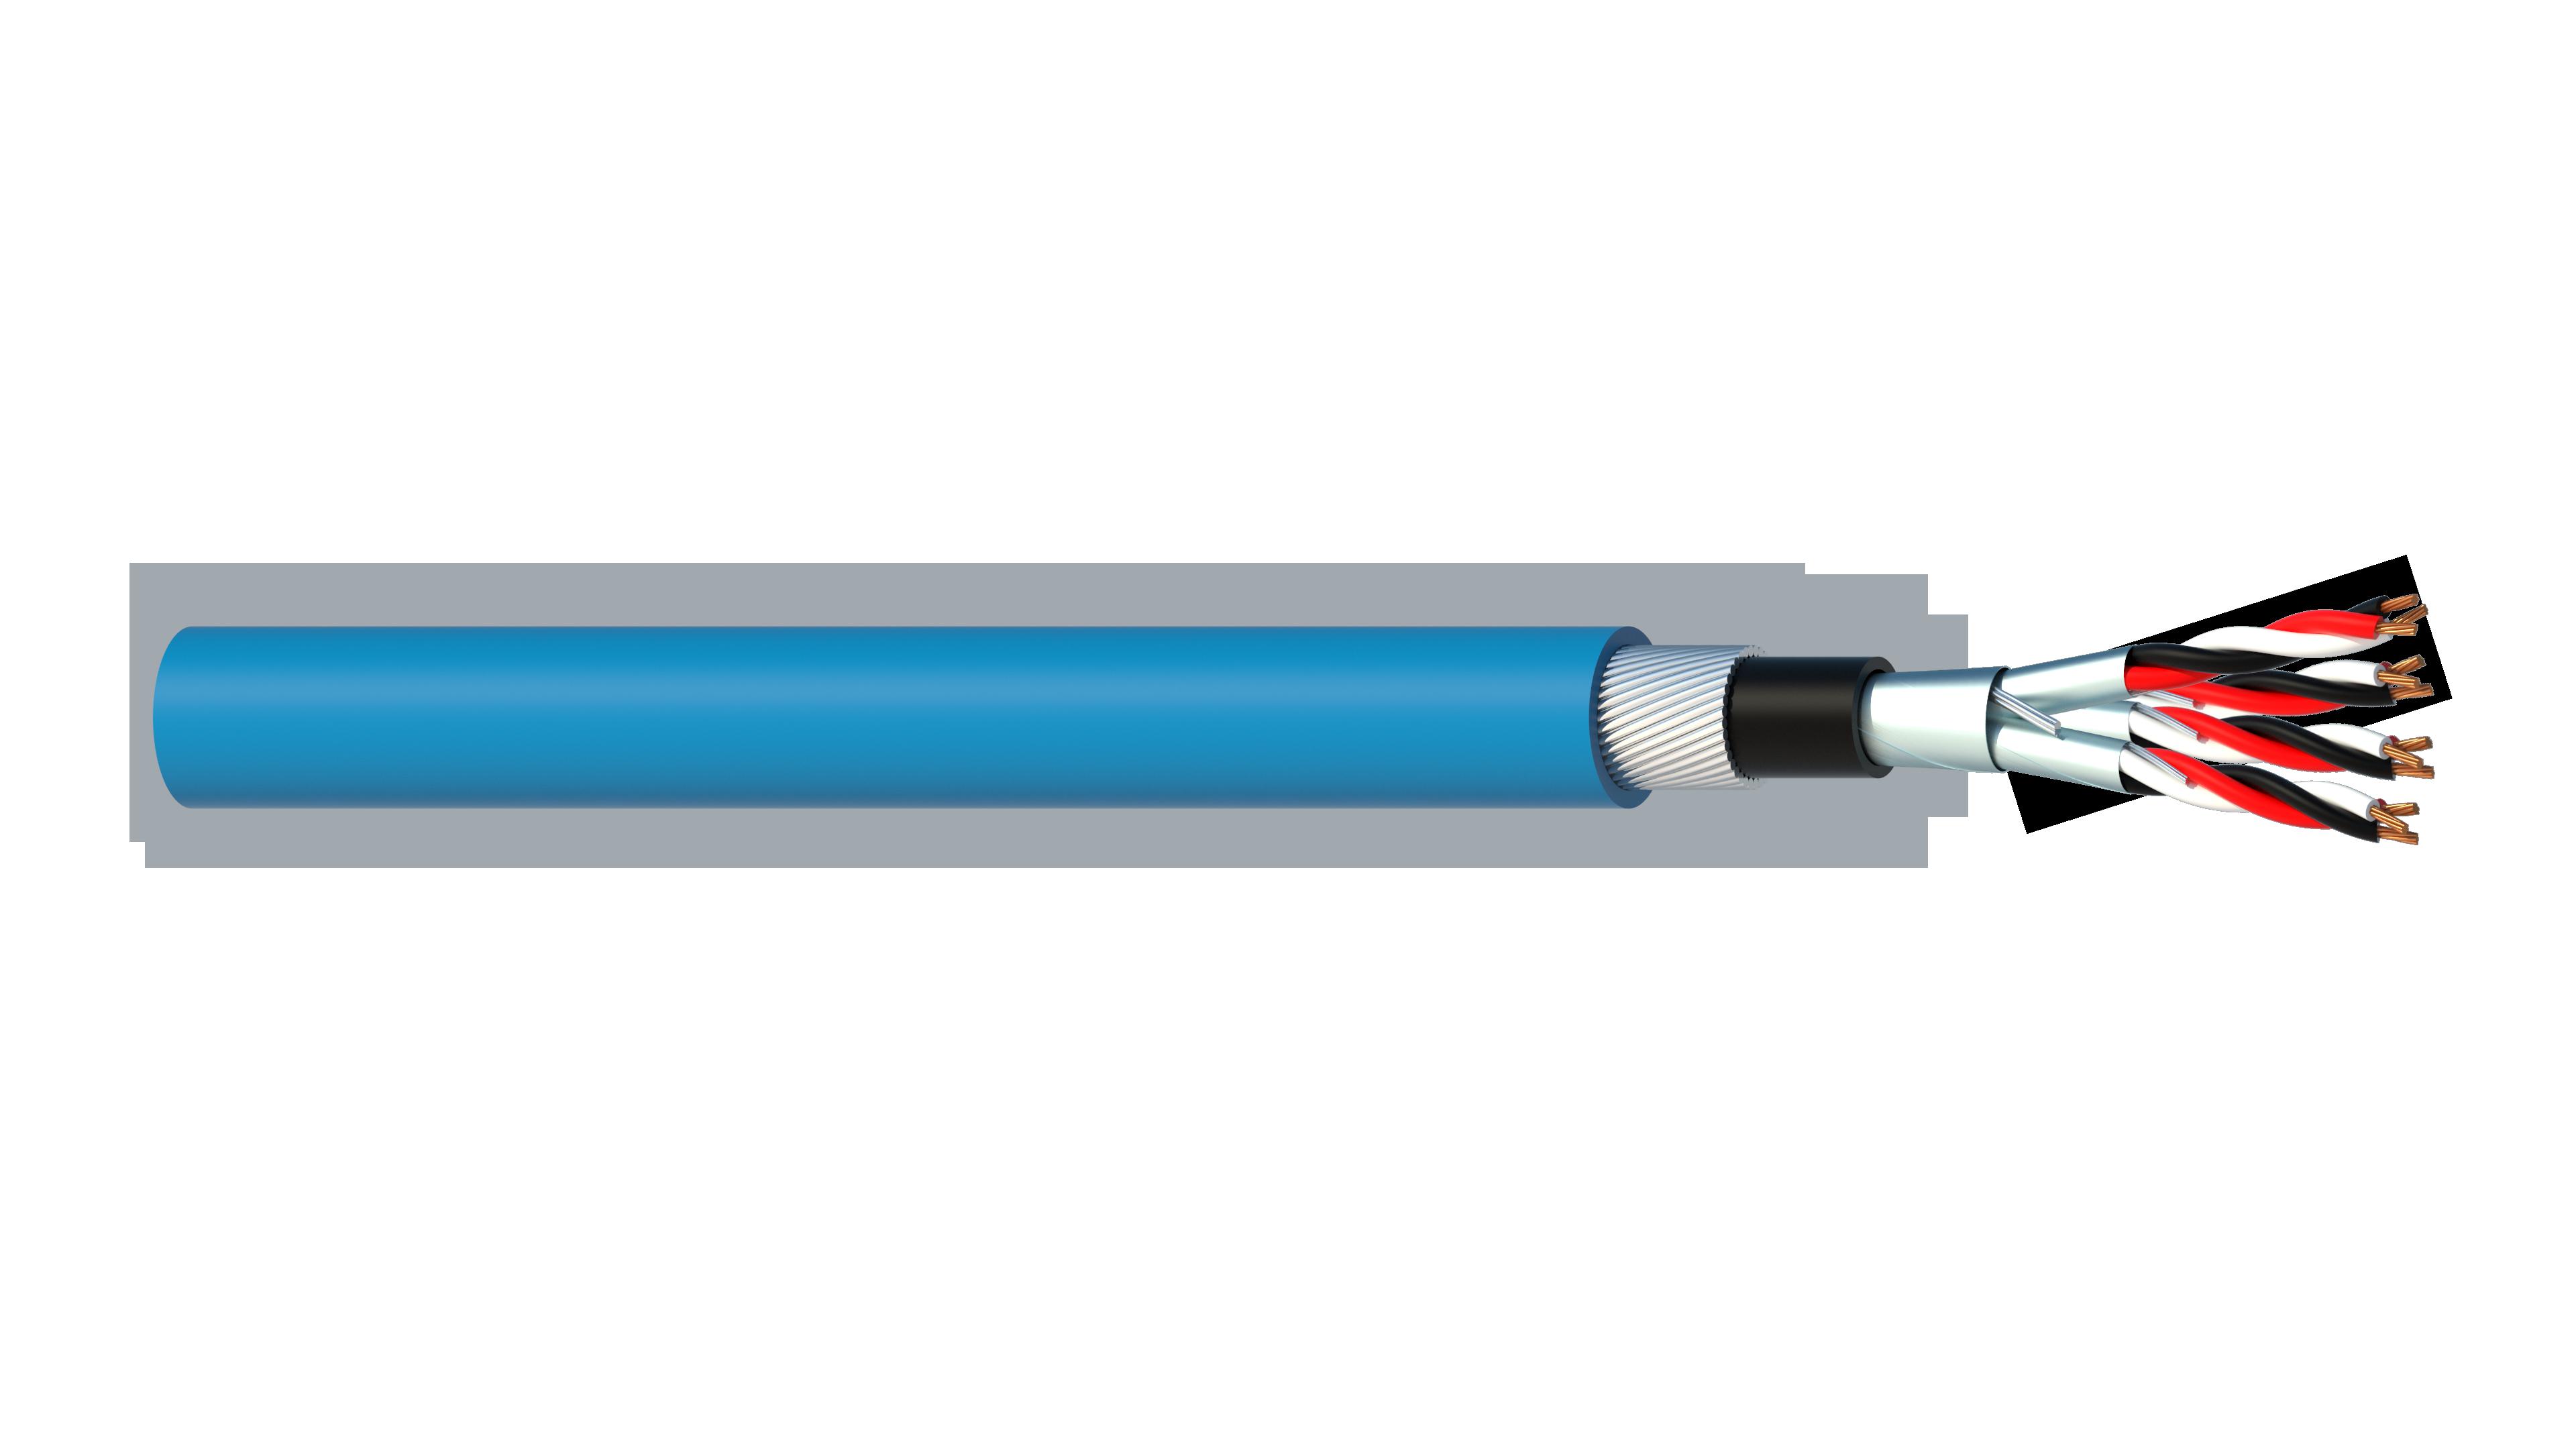 4 Triad 0.5mm2 Cu/PVC/ISOS/PVC/SWA/PVC Maser Instrumentation Cable - Blue Sheath